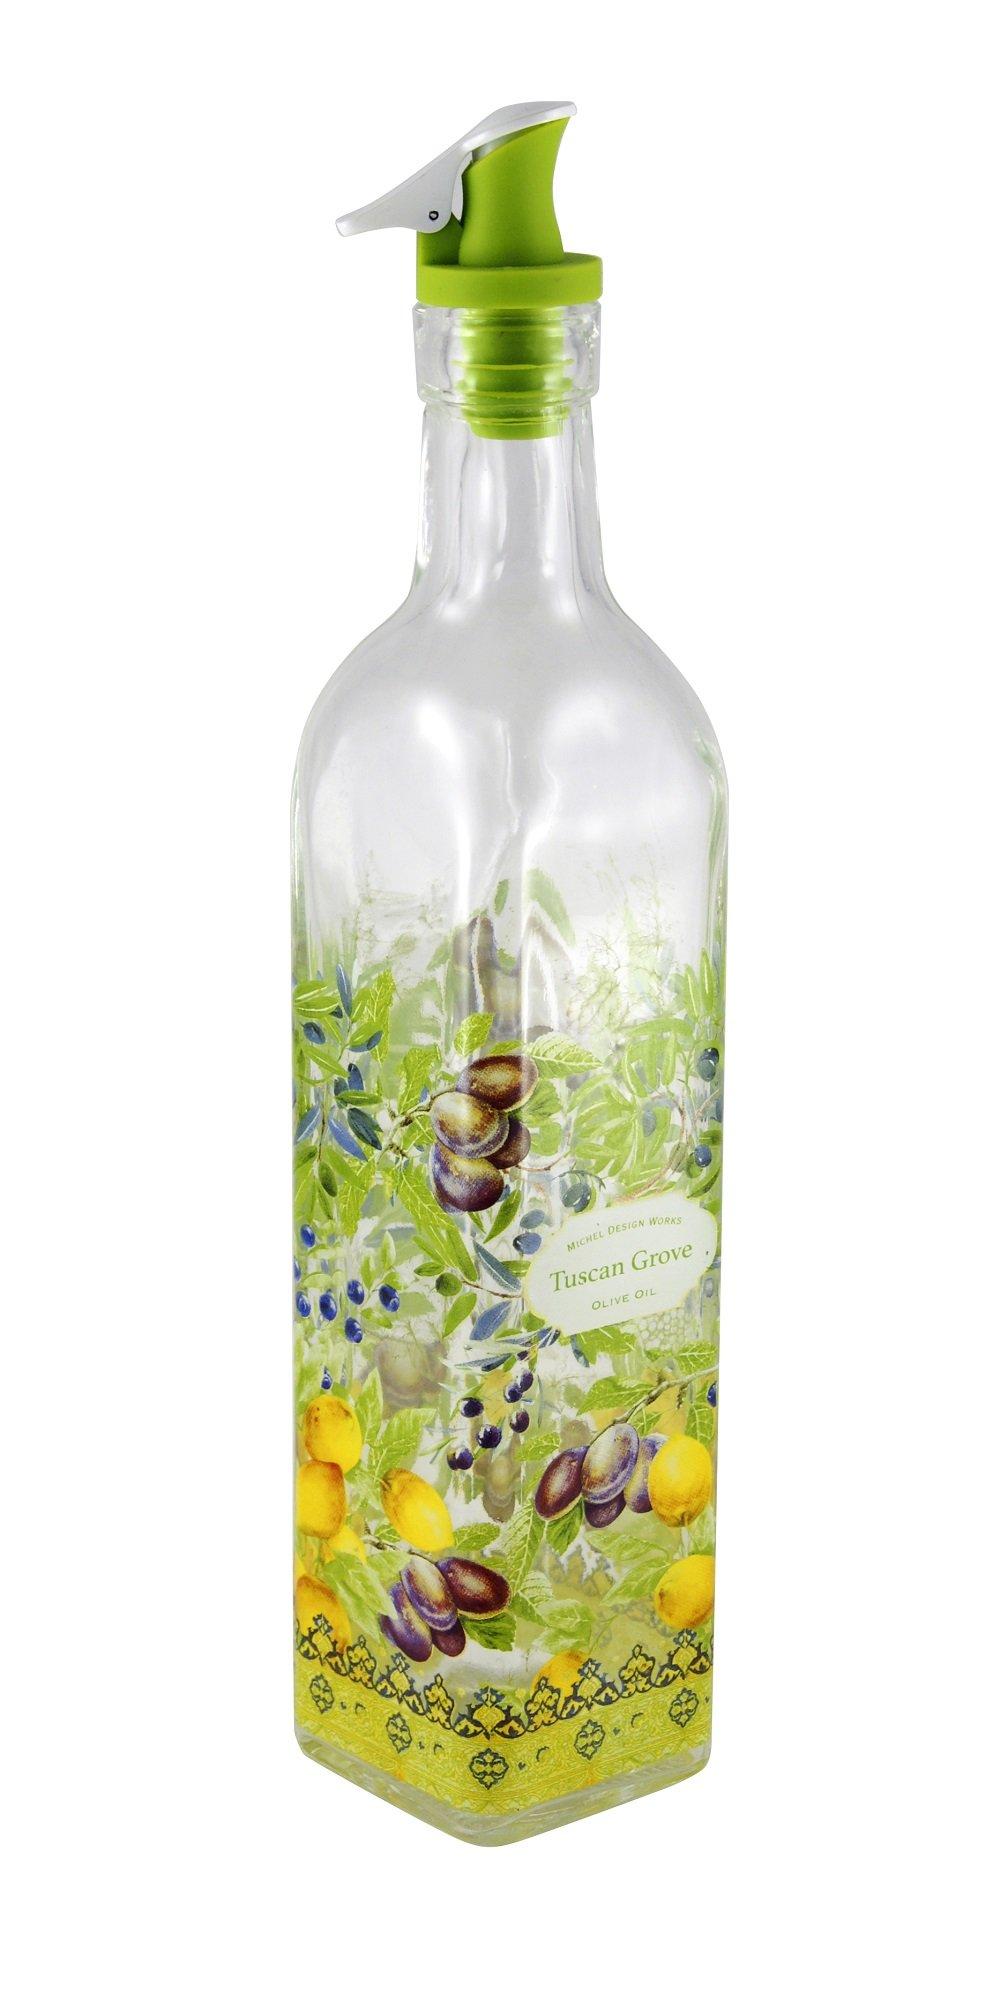 Grant Howard Tuscan Grove Oil and Vinegar Cruet, 16 oz.